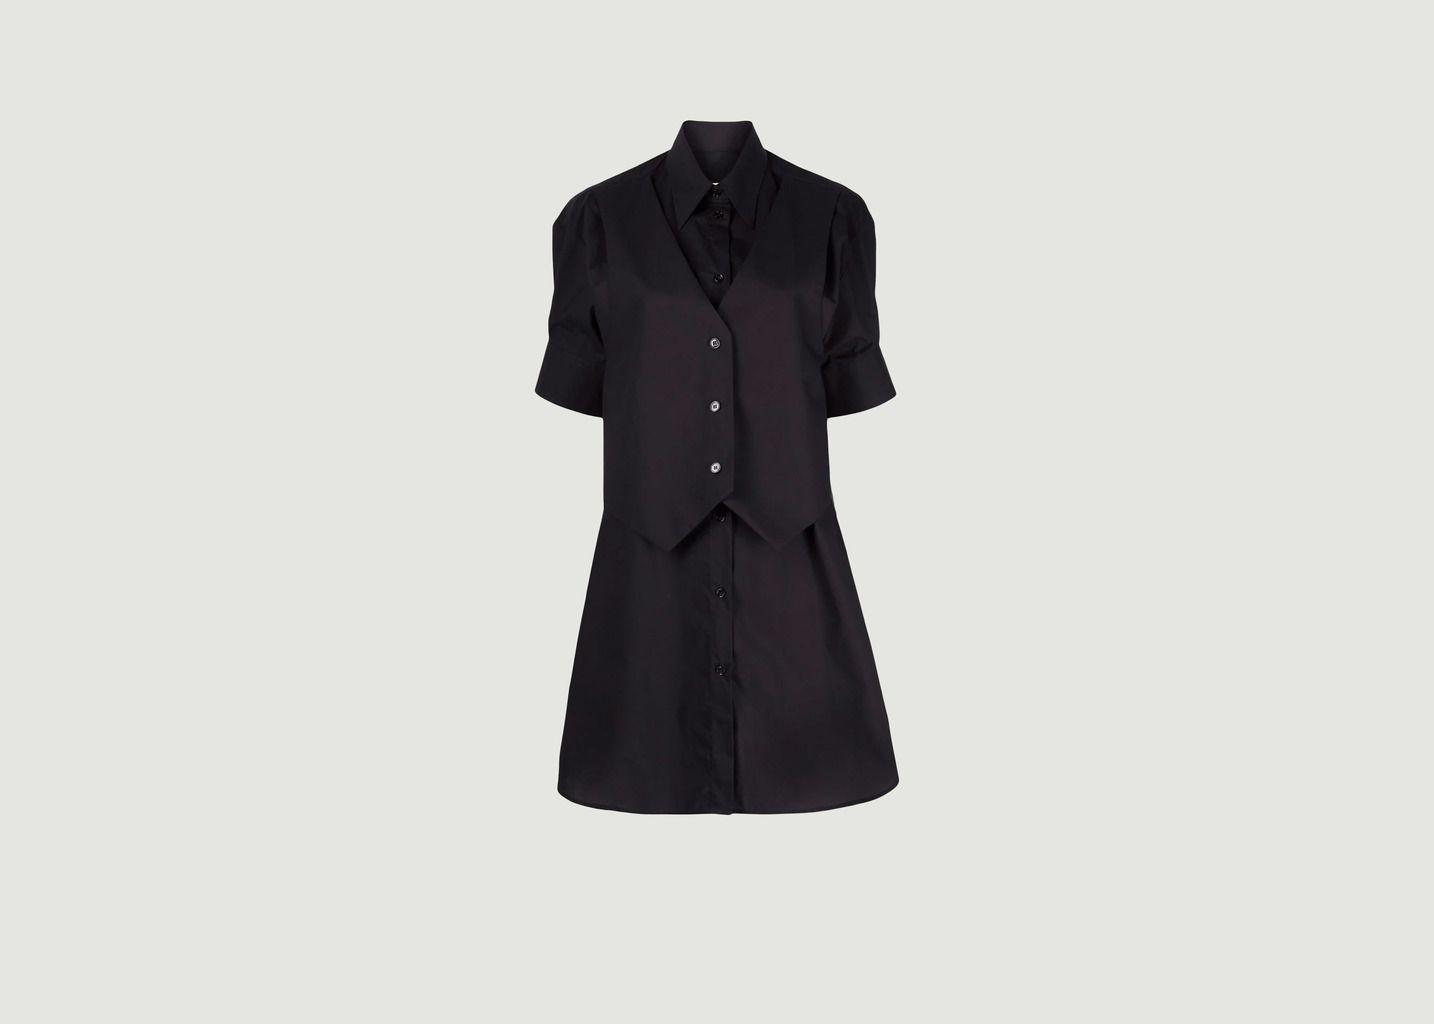 Robe chemise et veston - MM6 Maison Margiela